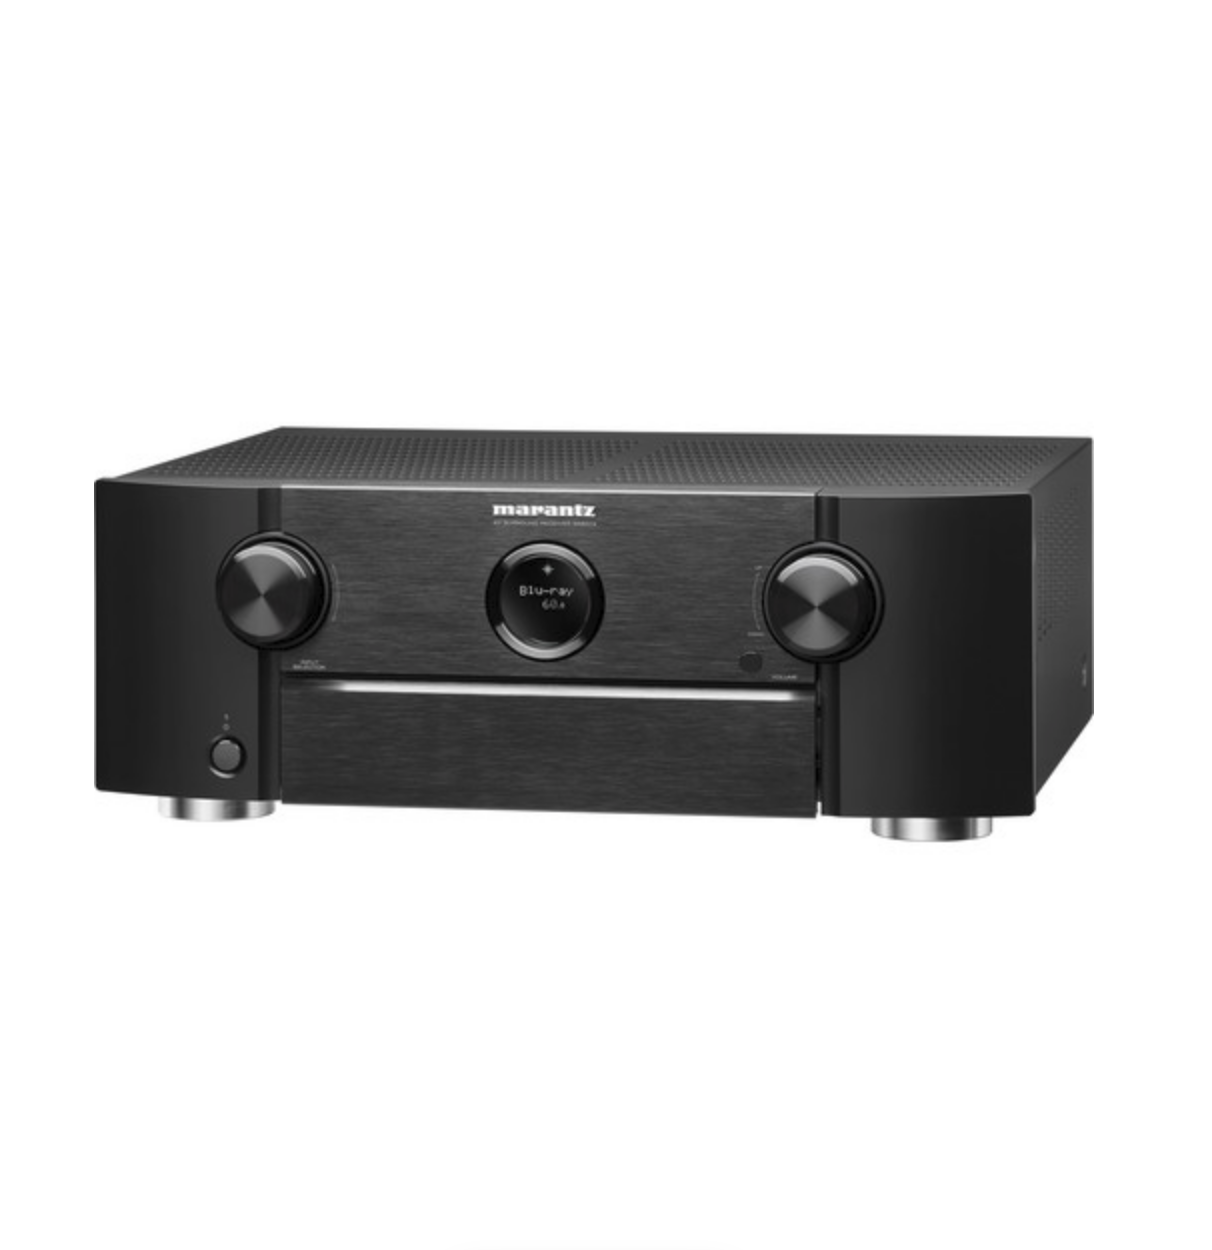 Marantz SR6014 Receiver 9.2 Dolby Atmos Heos AirPlay 2 Siri Alexa Google Assistante Bluetooth Wifi Zona 2 - 110V